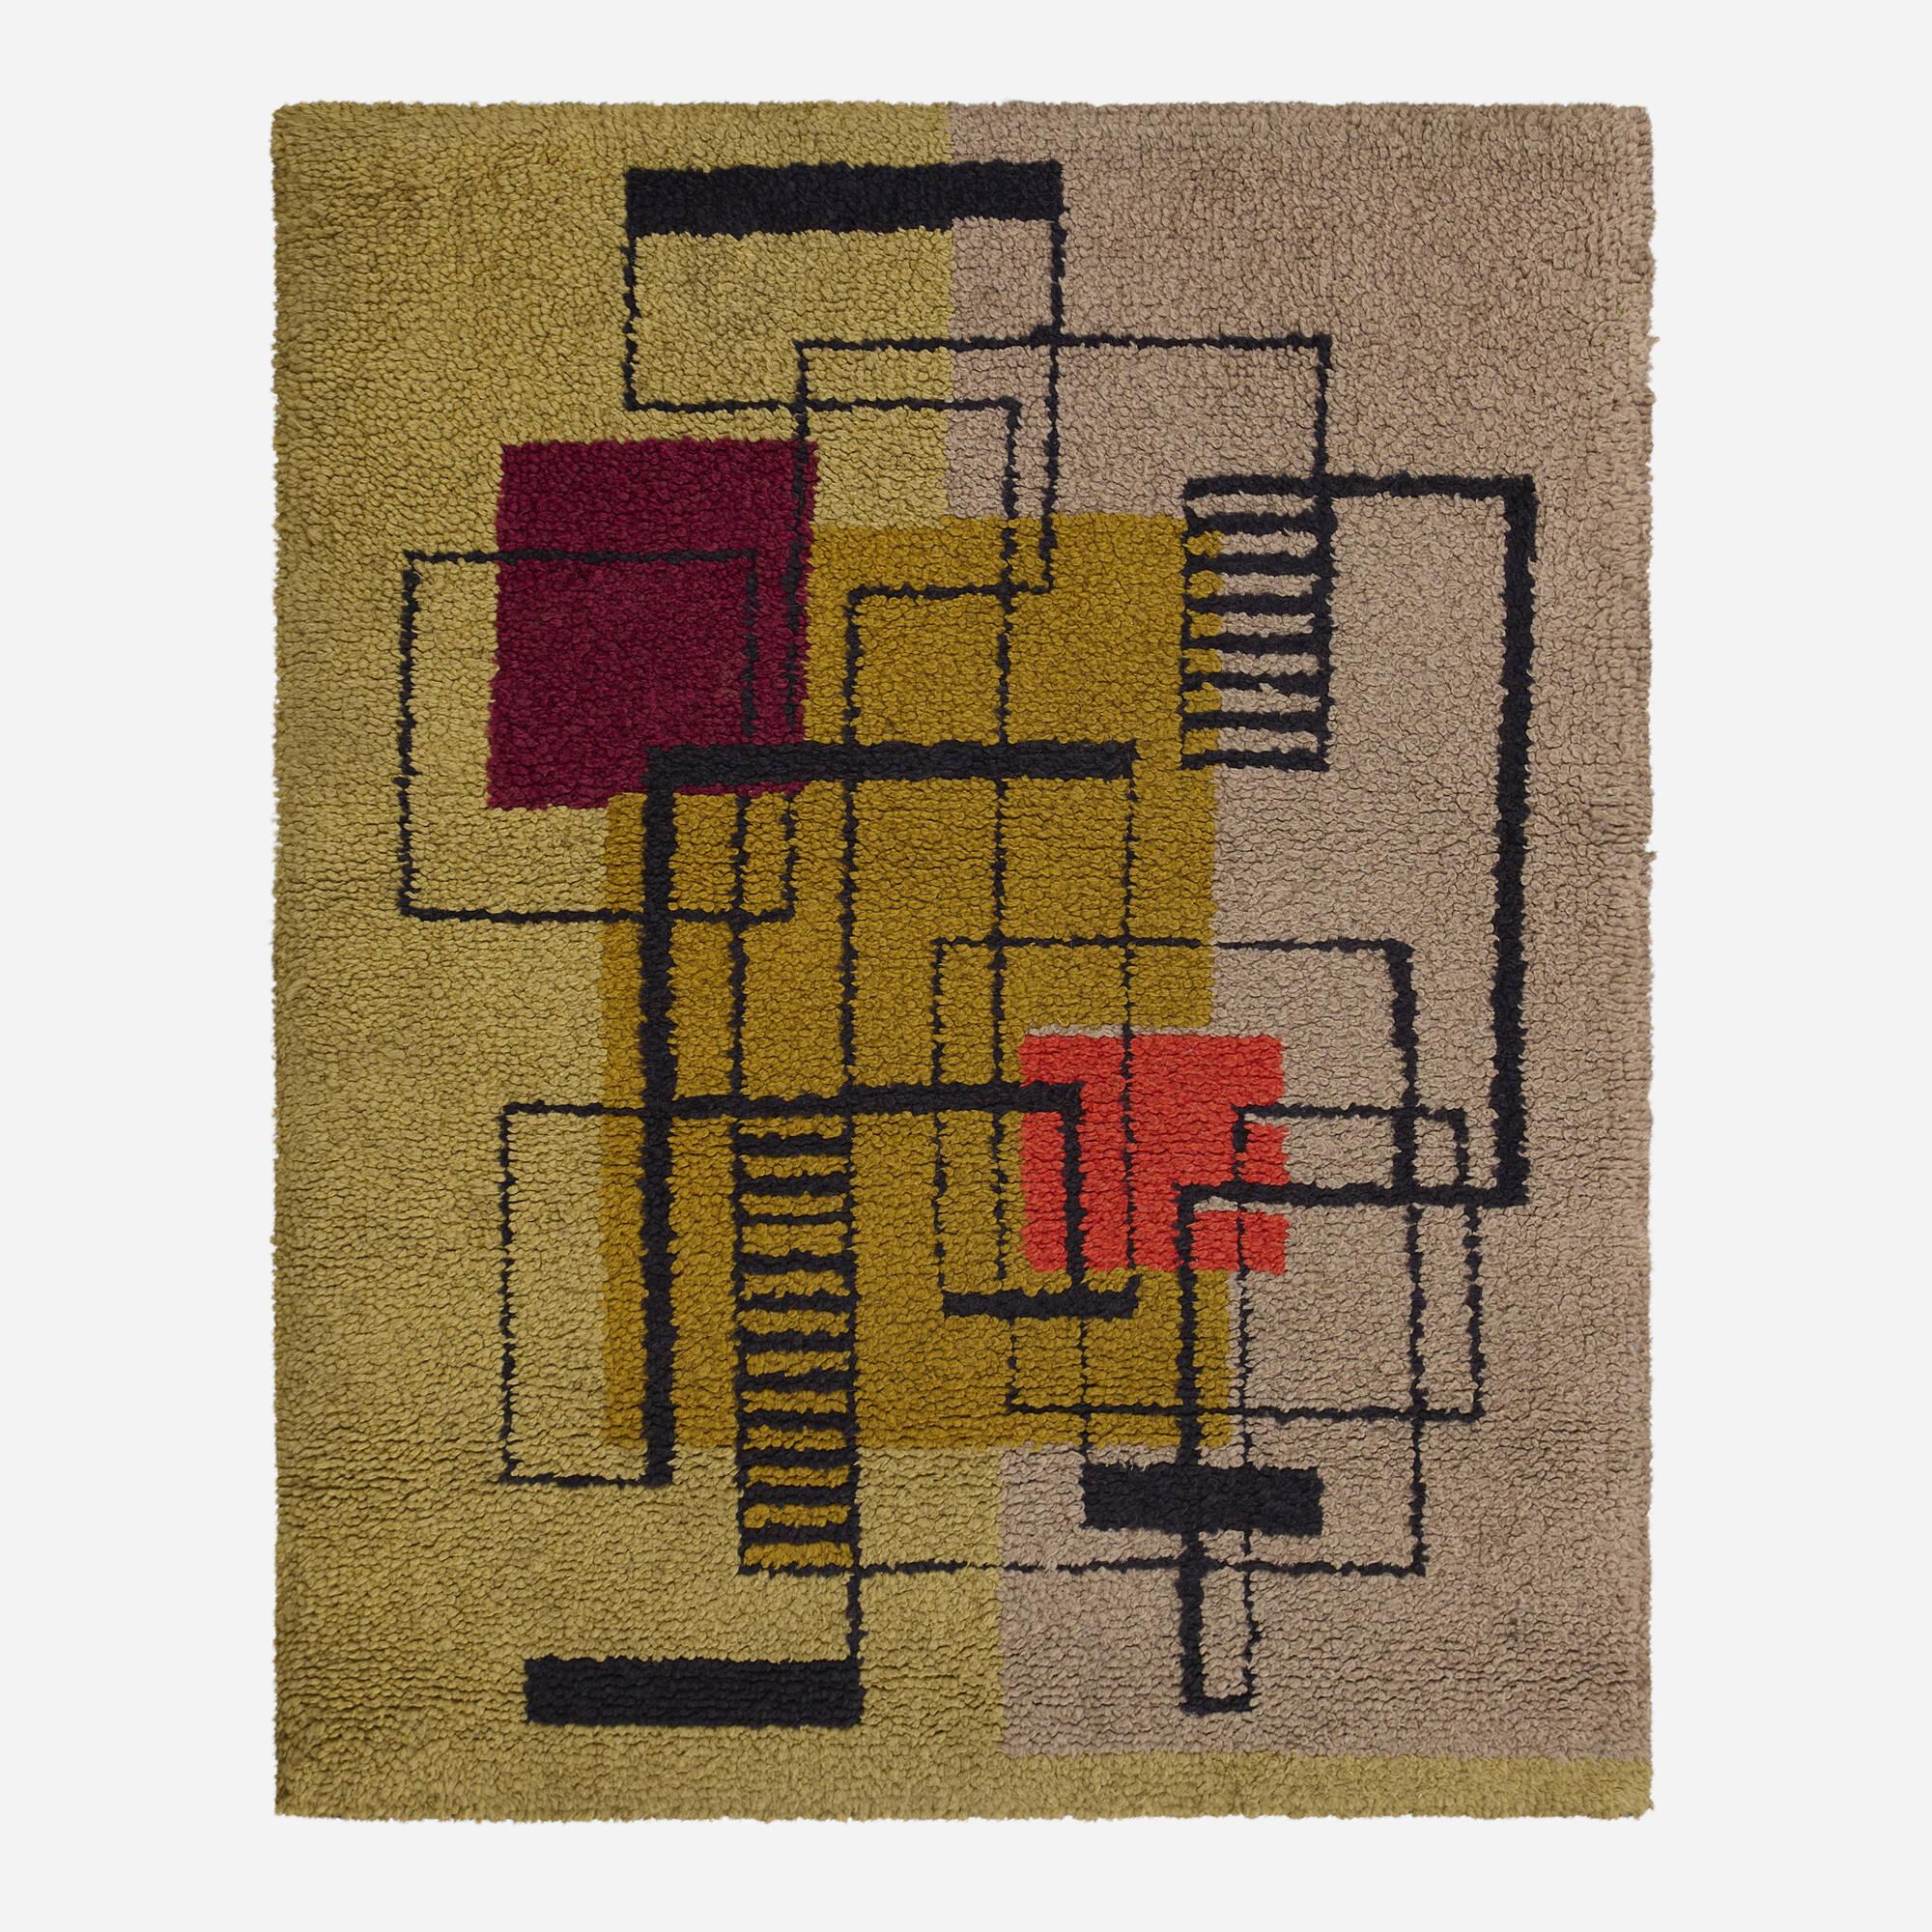 213: Constructivist / pile carpet (1 of 1)